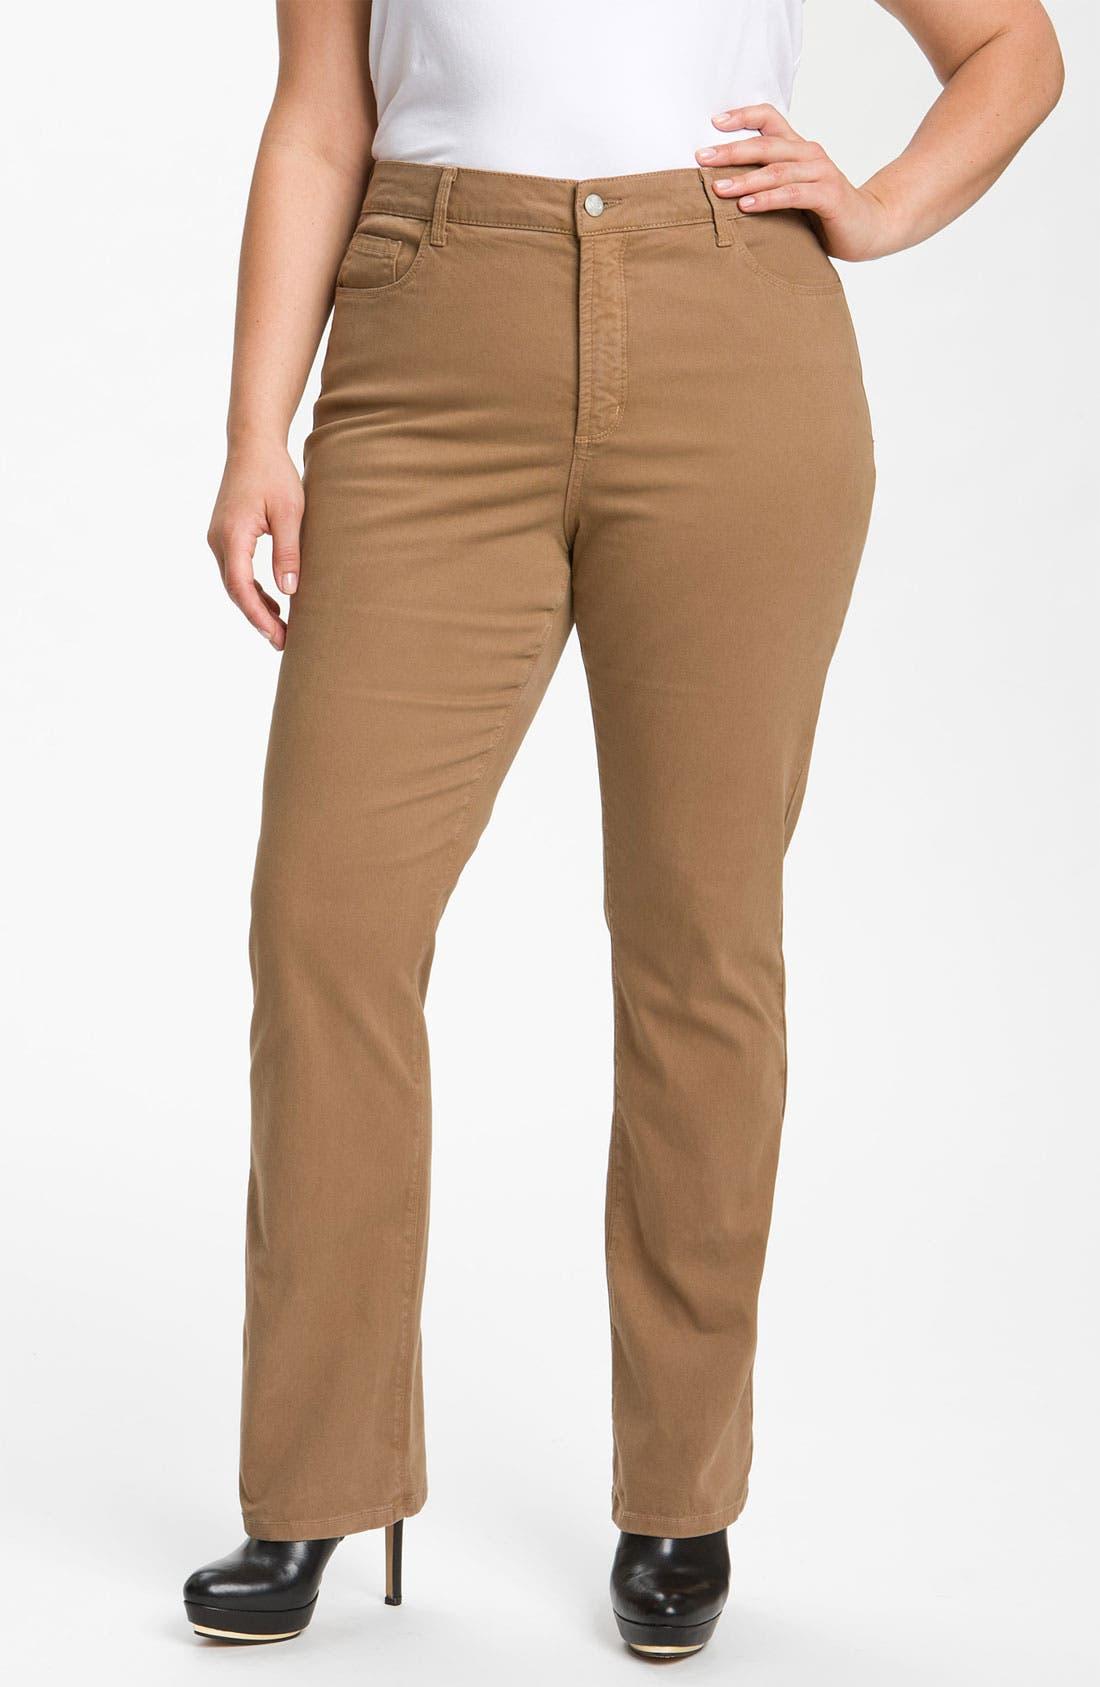 Alternate Image 1 Selected - NYDJ 'Marilyn' Straight Leg Stretch Twill Jeans (Plus)